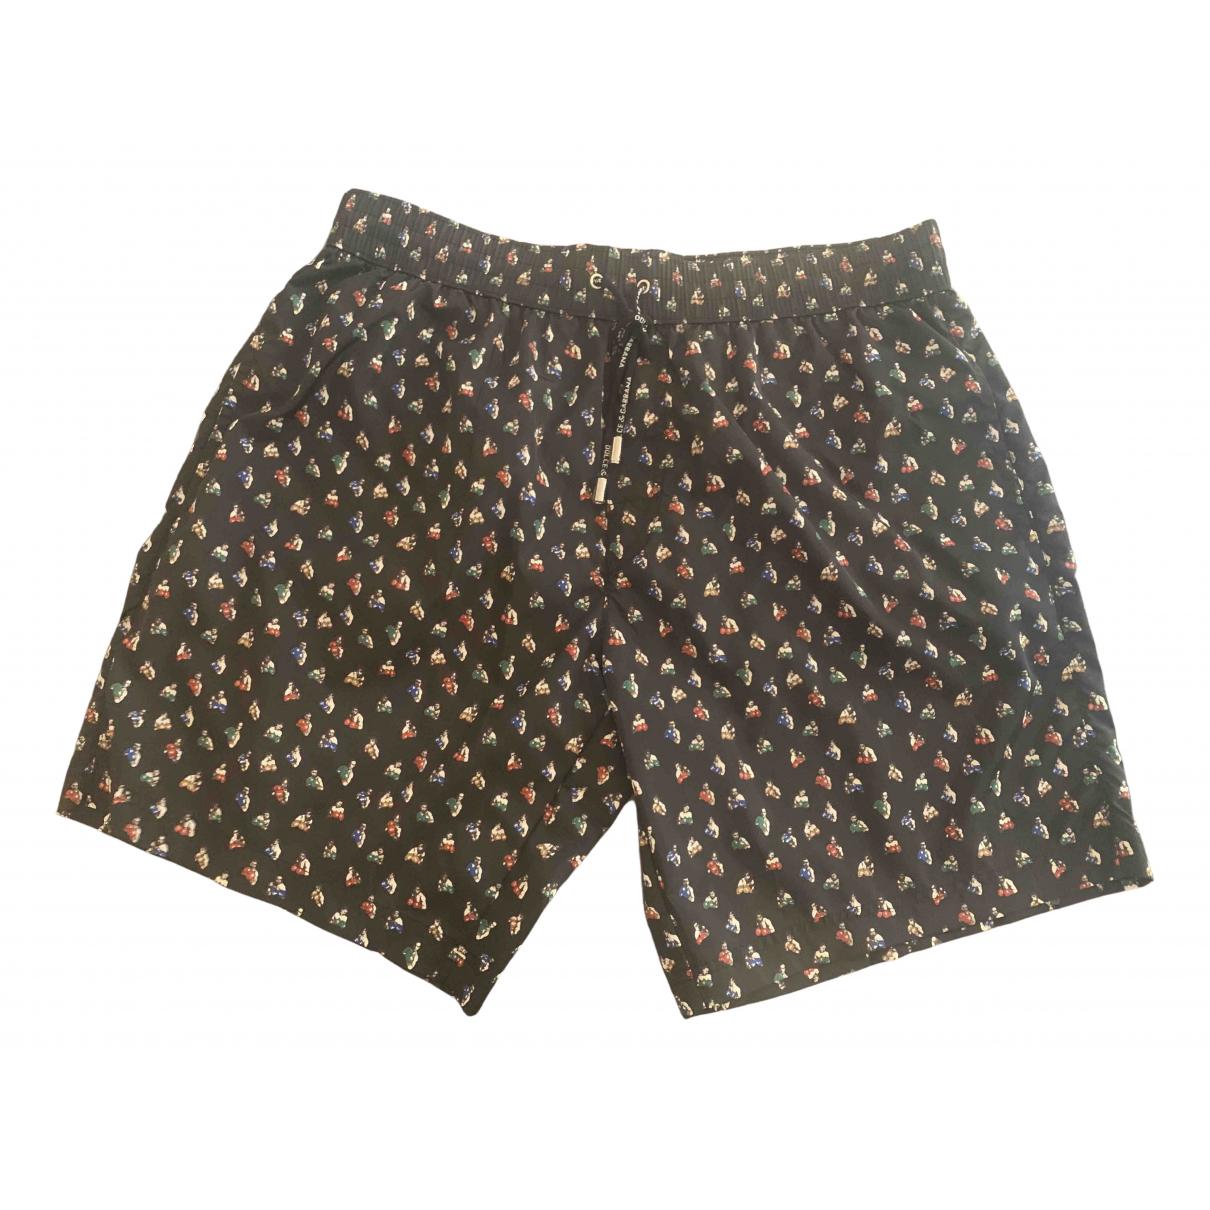 Dolce & Gabbana \N Black Swimwear for Men M International